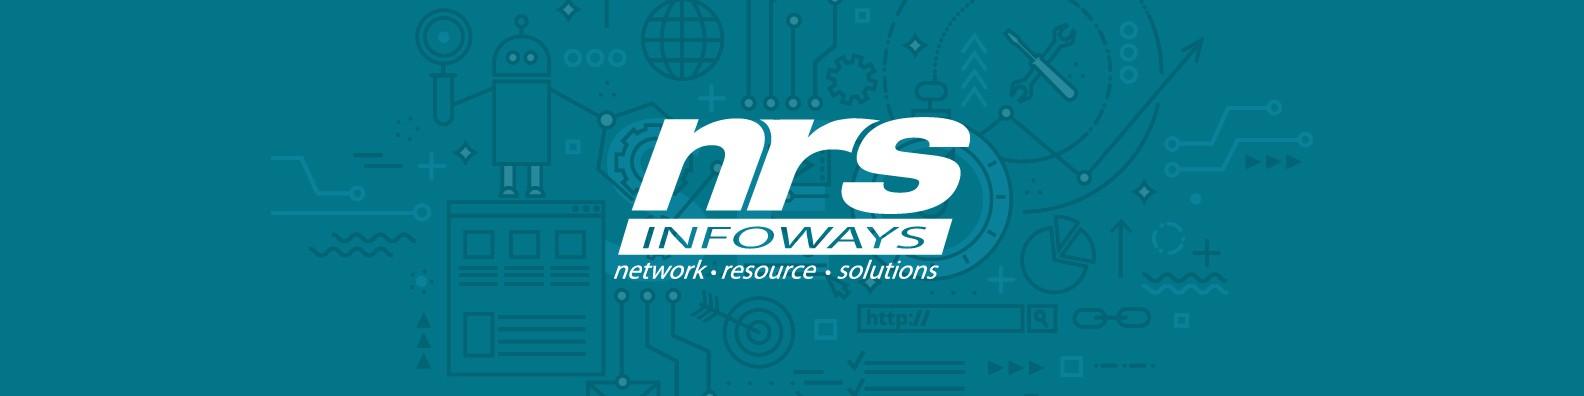 NRS Infoways LLC | LinkedIn